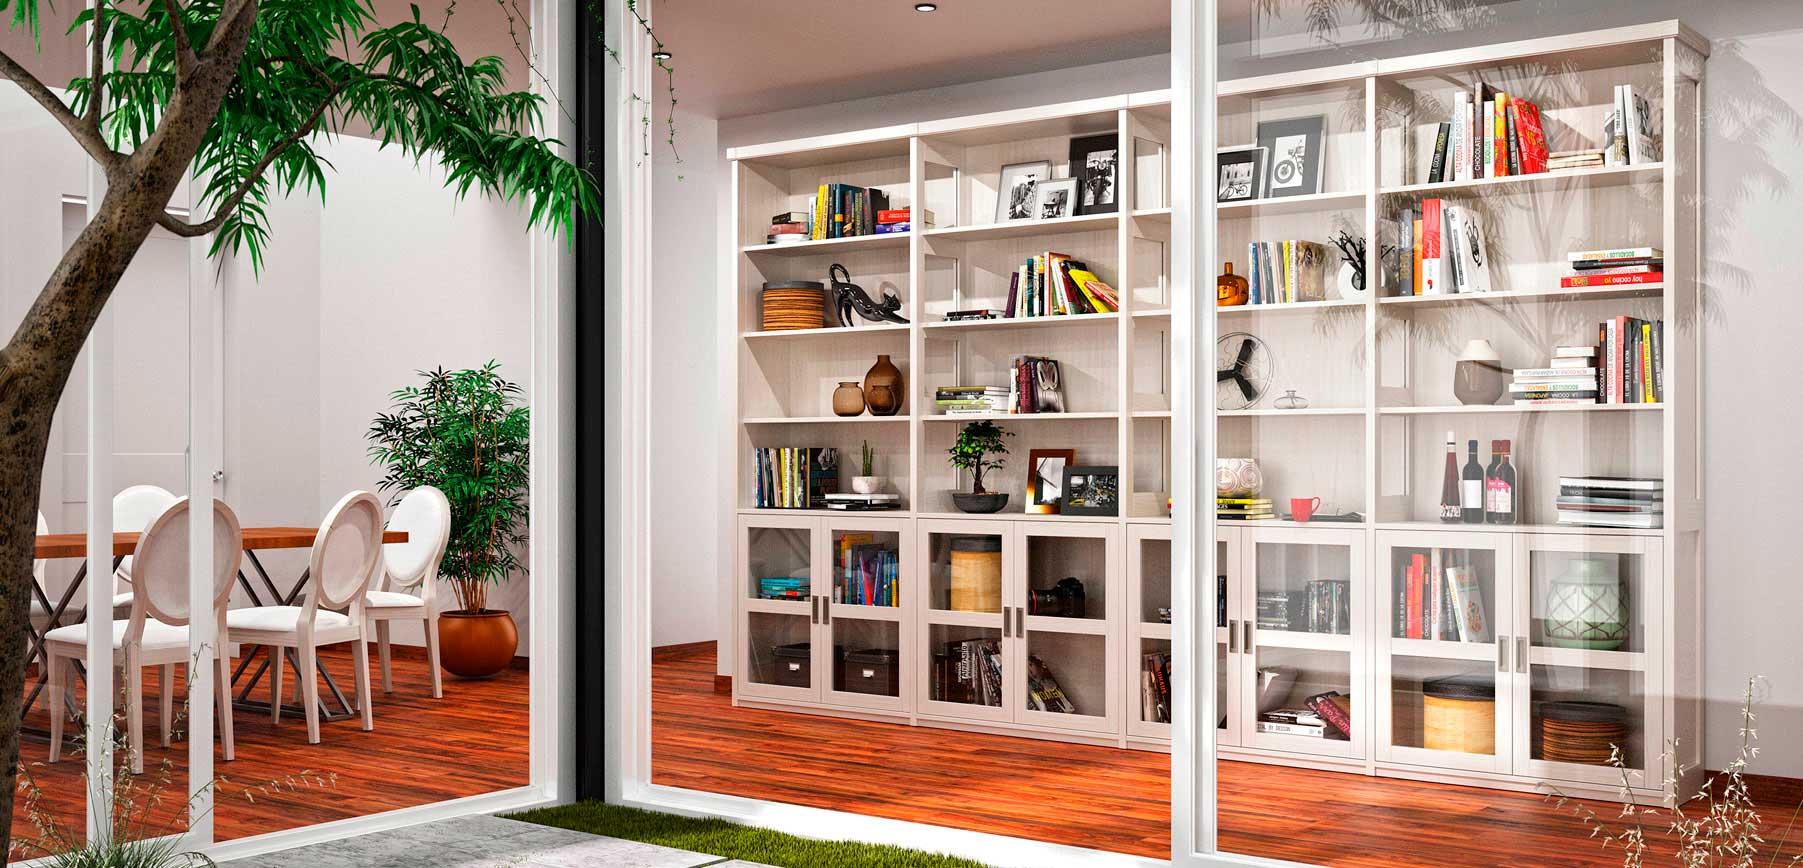 Muebles GRUPOSEYS - Muebles | Furniture | Meubles | мебель seys-2-optim Inicio